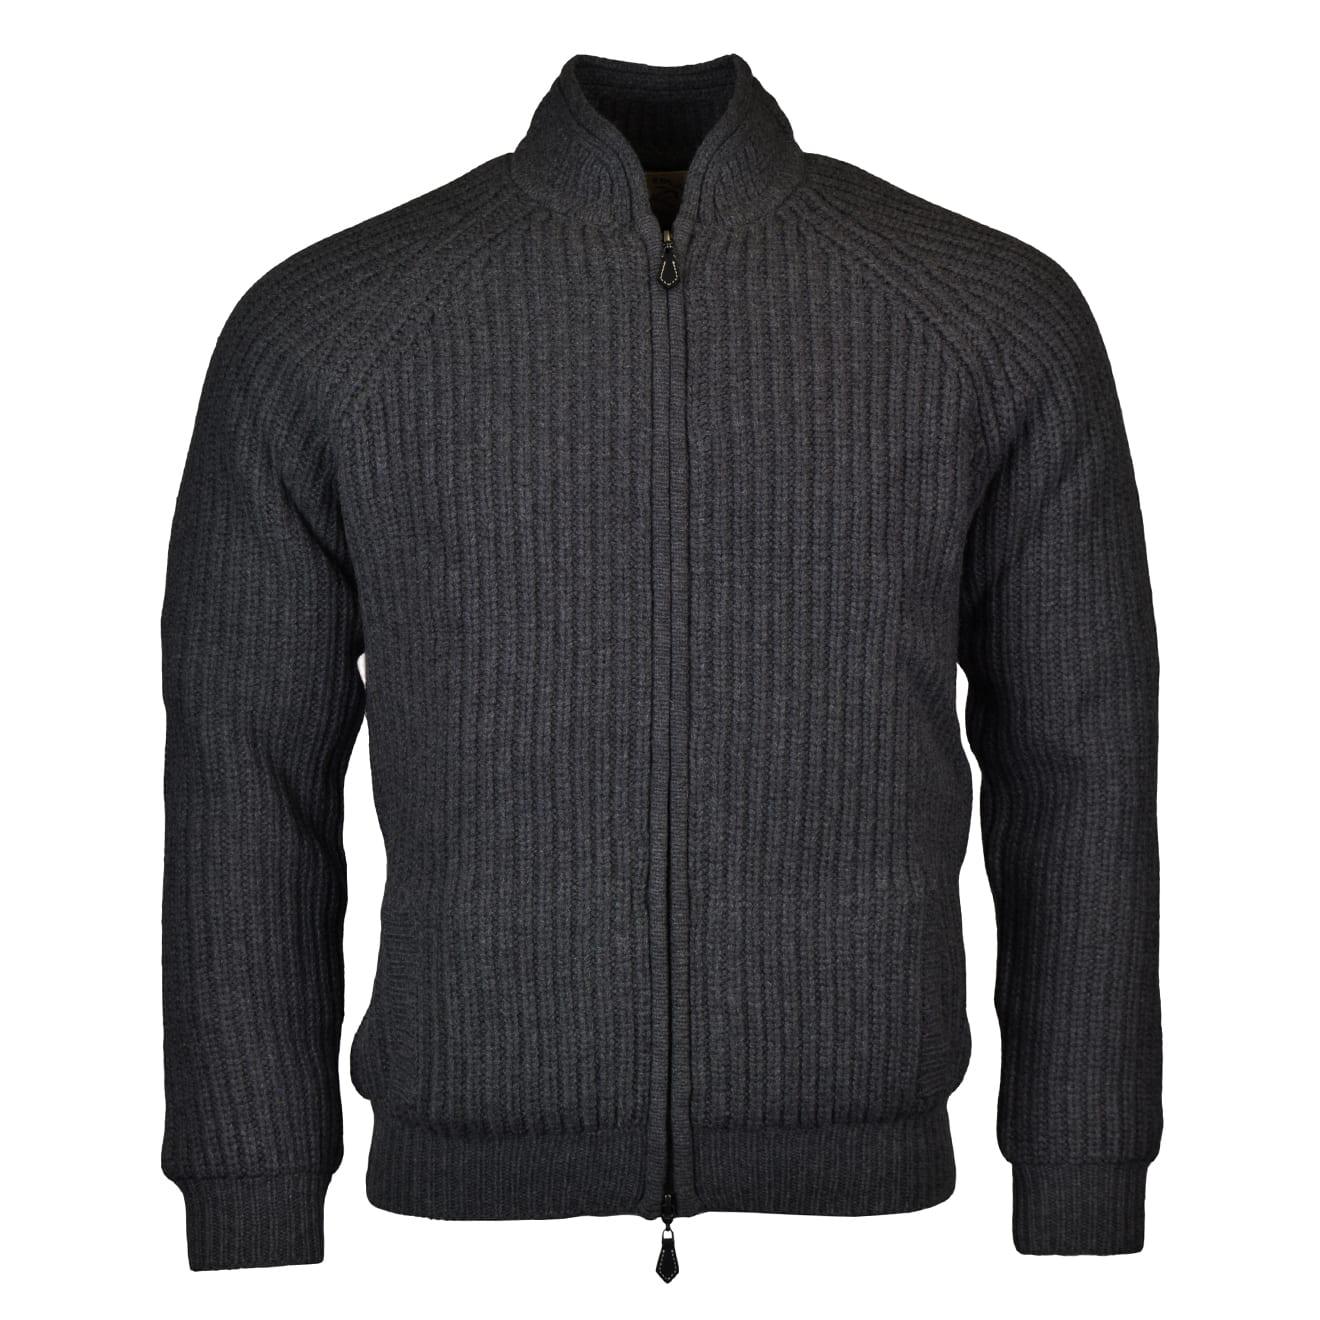 Alan Paine winterton zip front windstopper chunky knit derby 2